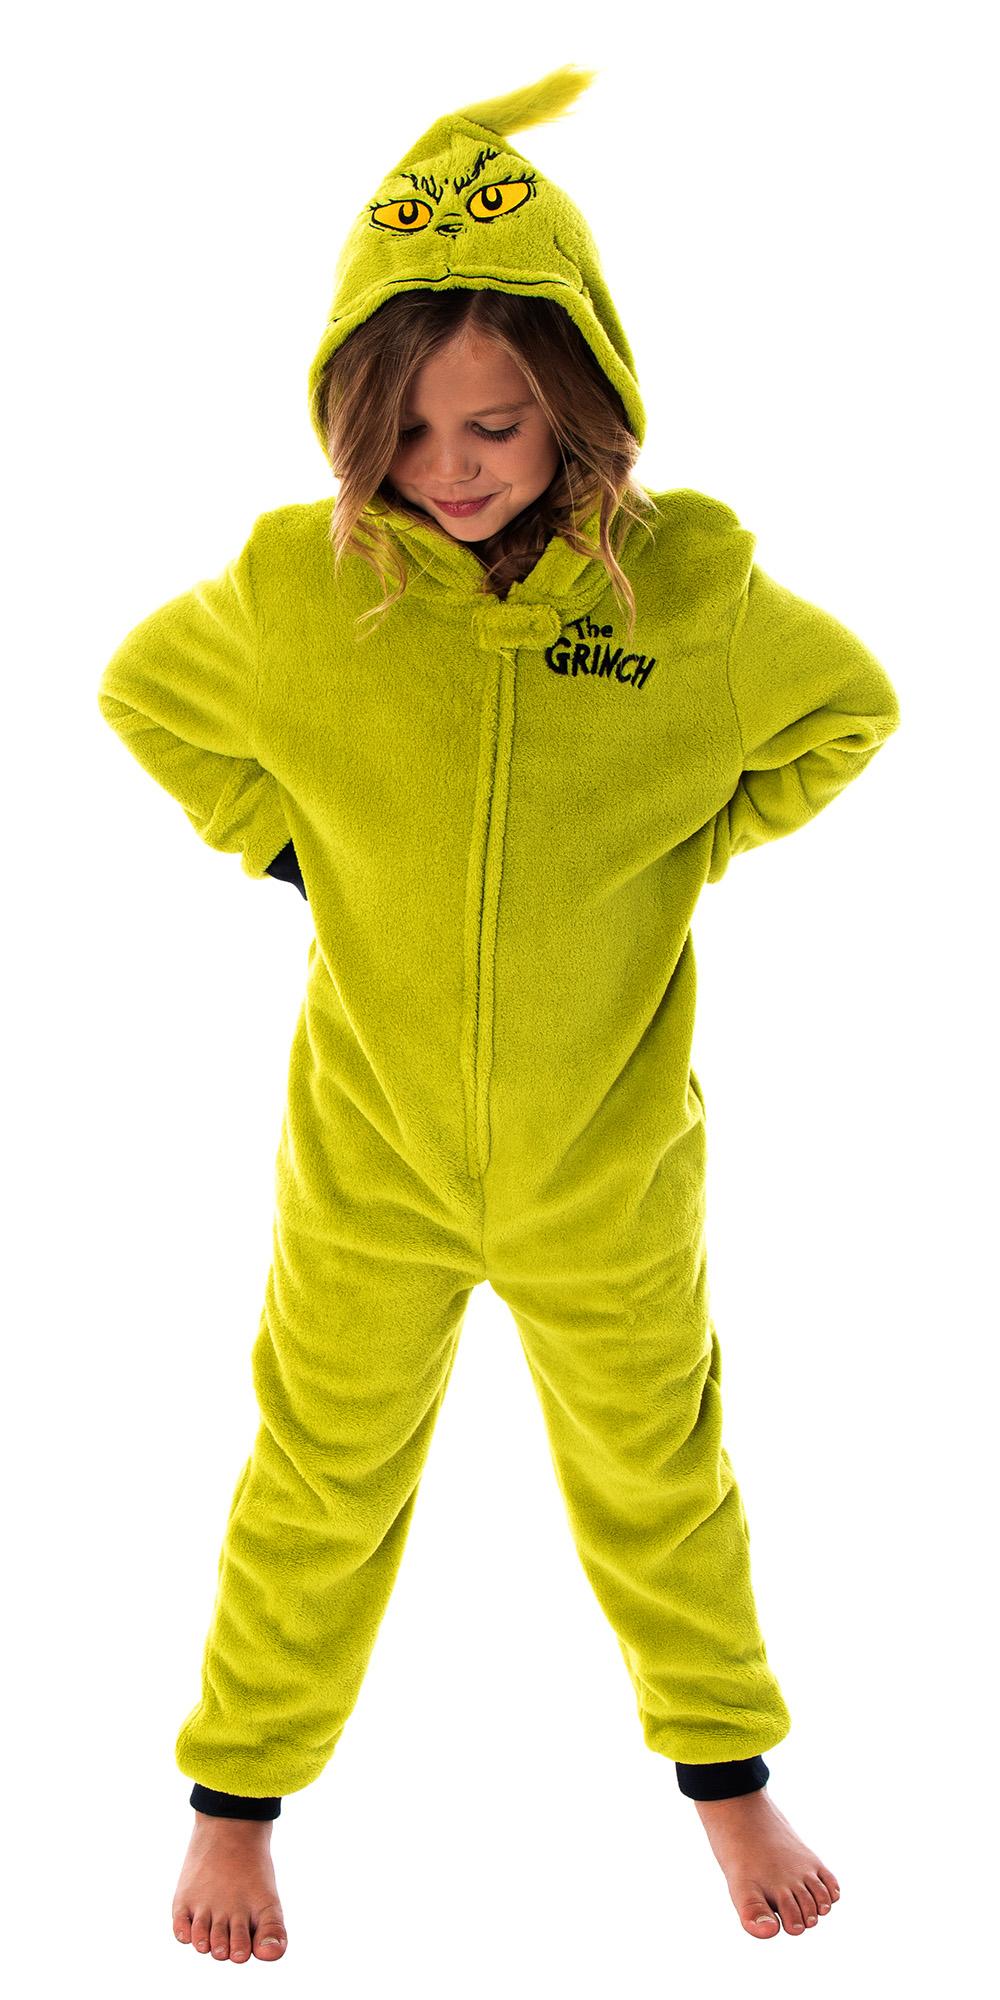 The Grinch One Piece Romper Suit 3D Children/'s Loungewear Pyjamas